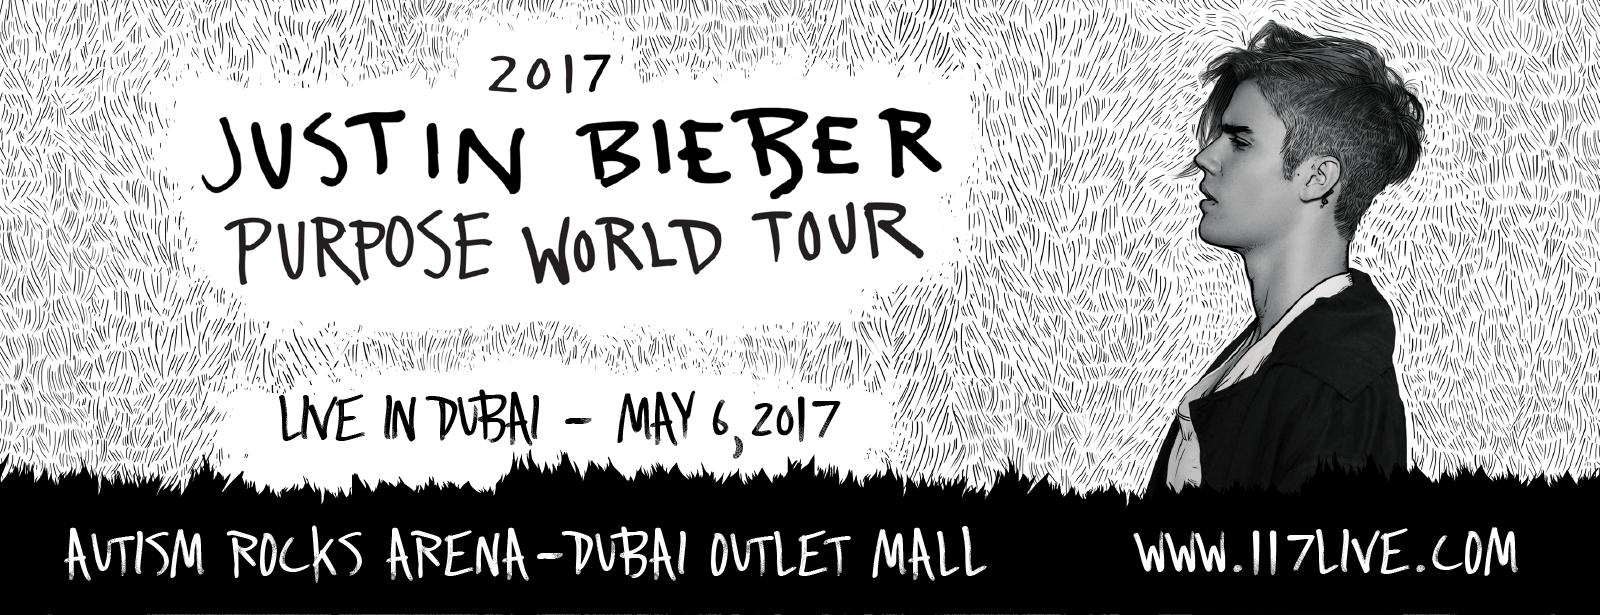 Justin Bieber Purpose World Tour 2017 Promo Promolover